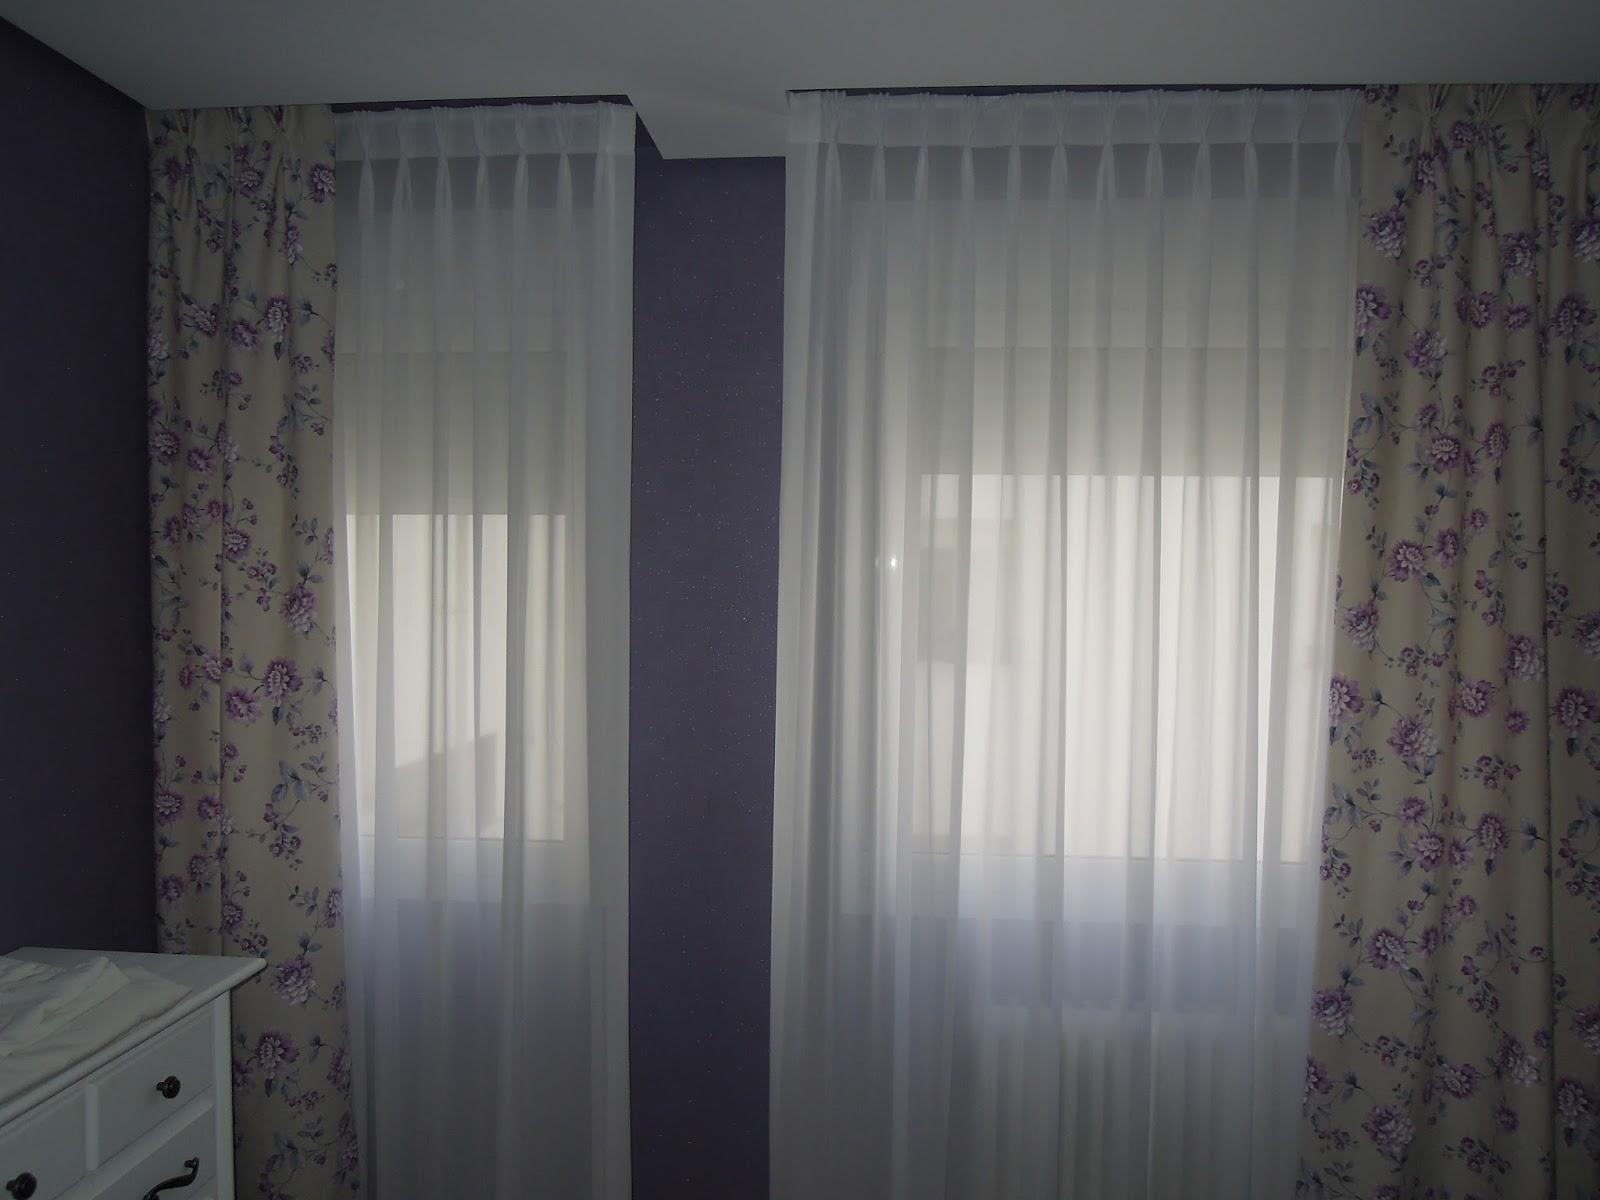 Fotos de cortinas como elegir unas cortinas aqui os - Como elegir cortinas ...